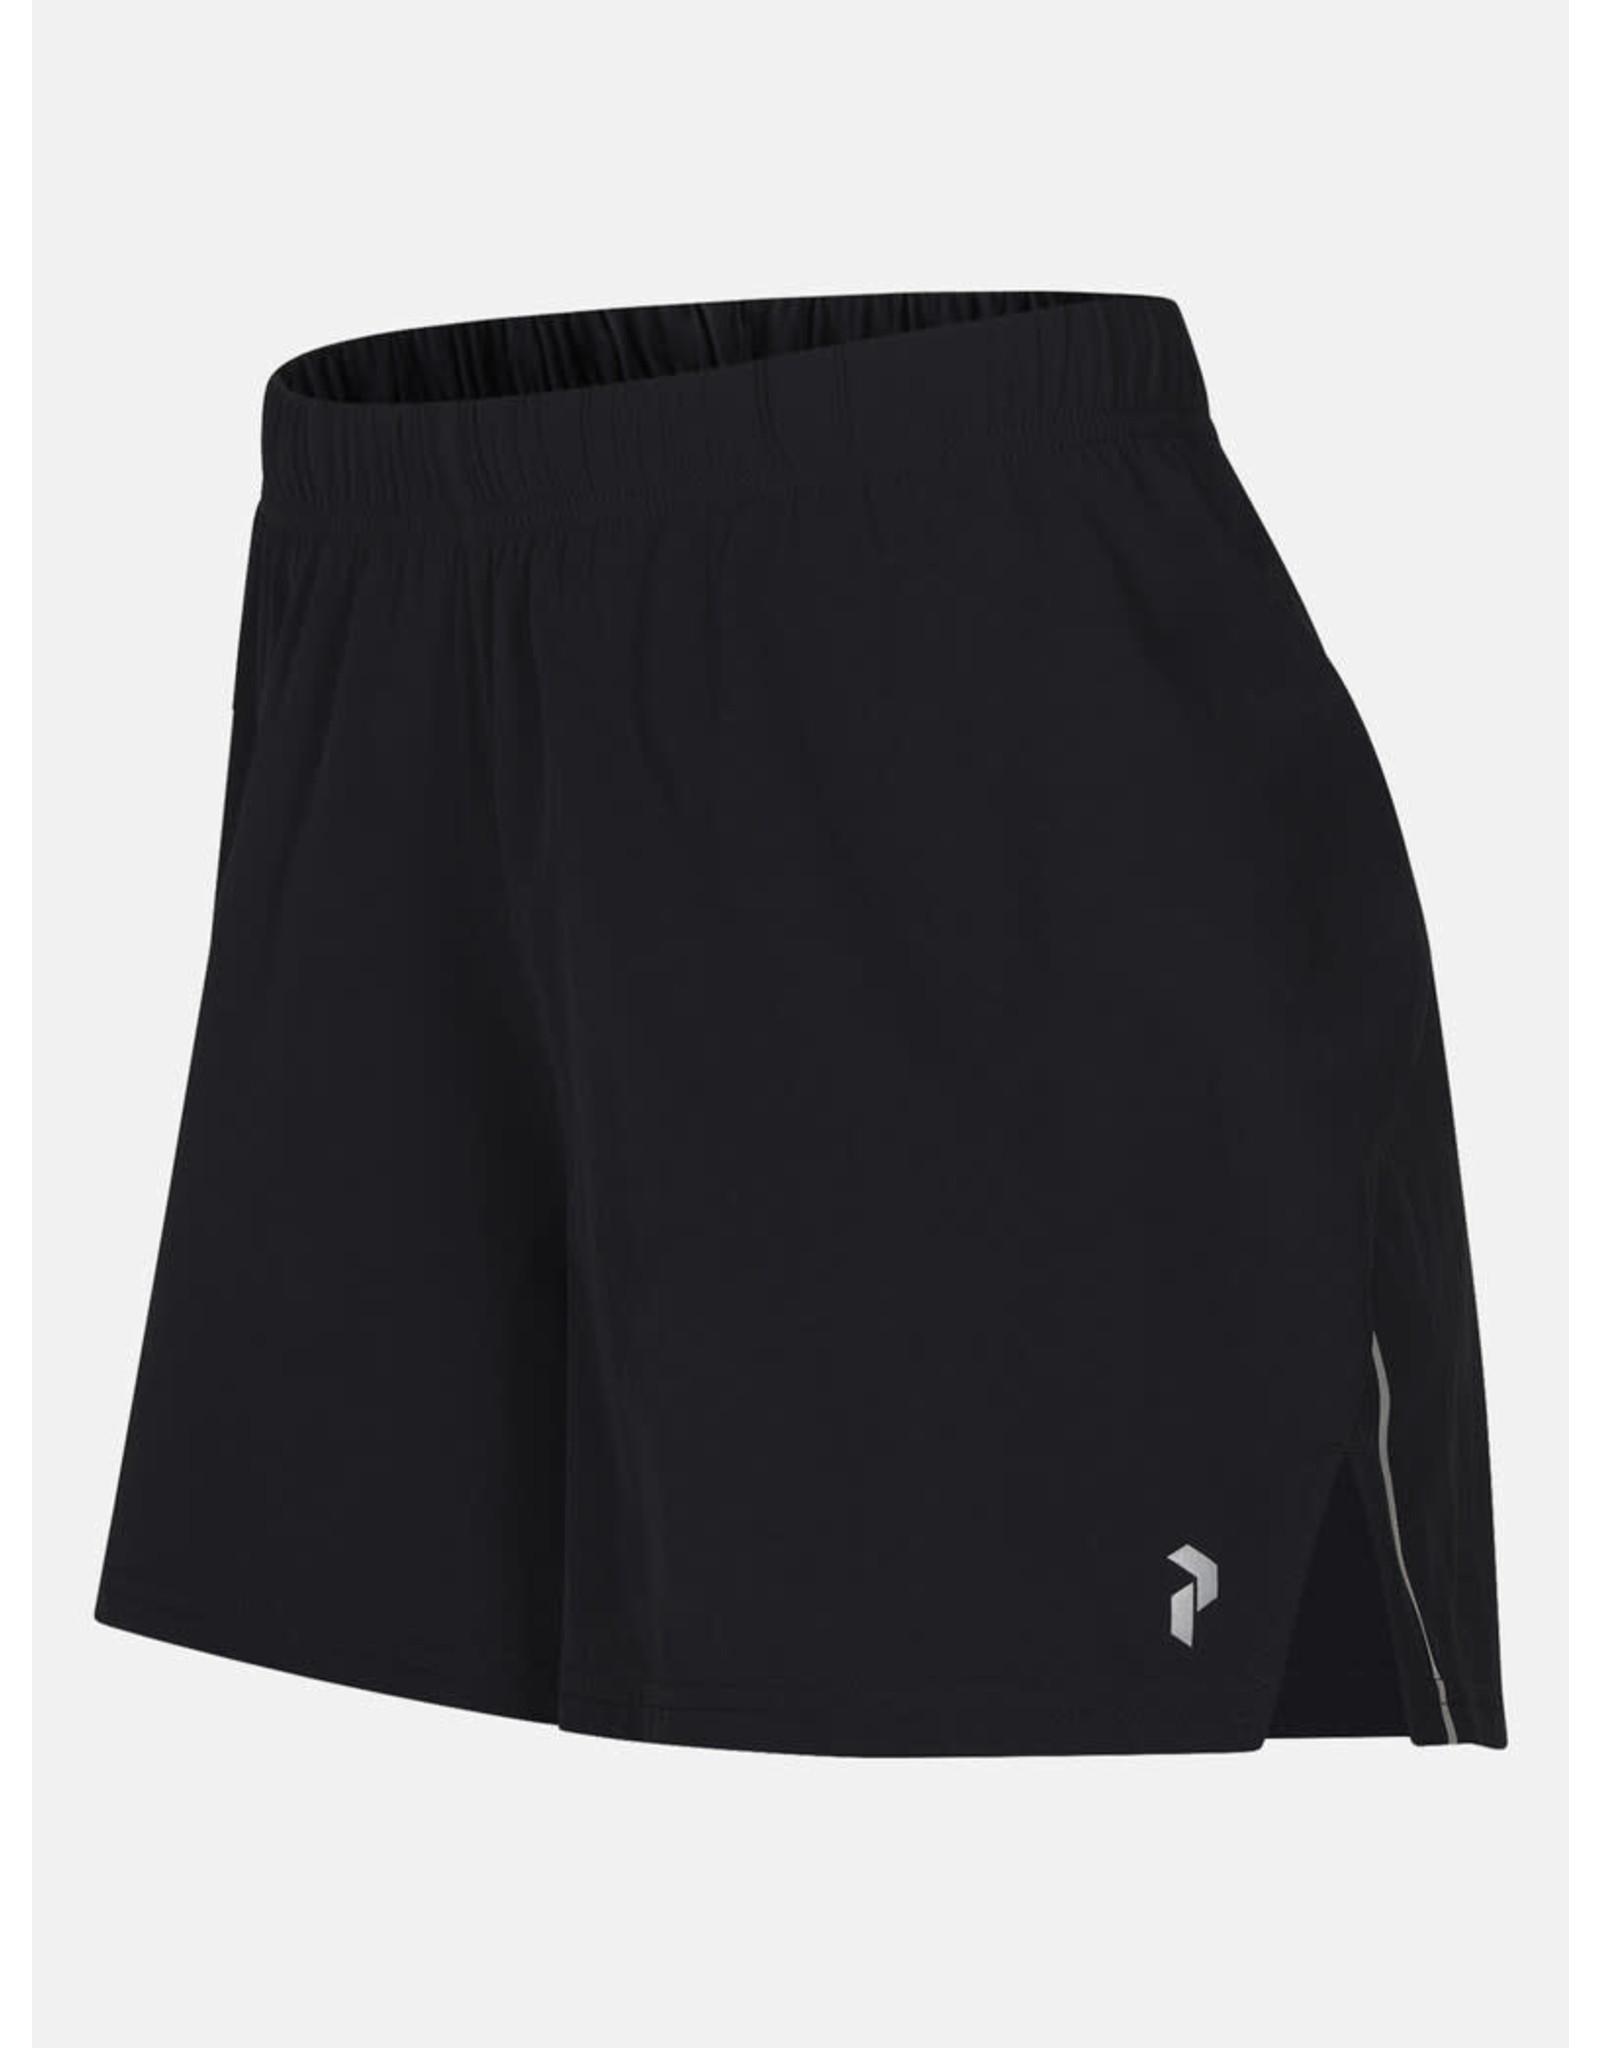 Peak Performance Alum Light Shorts Women